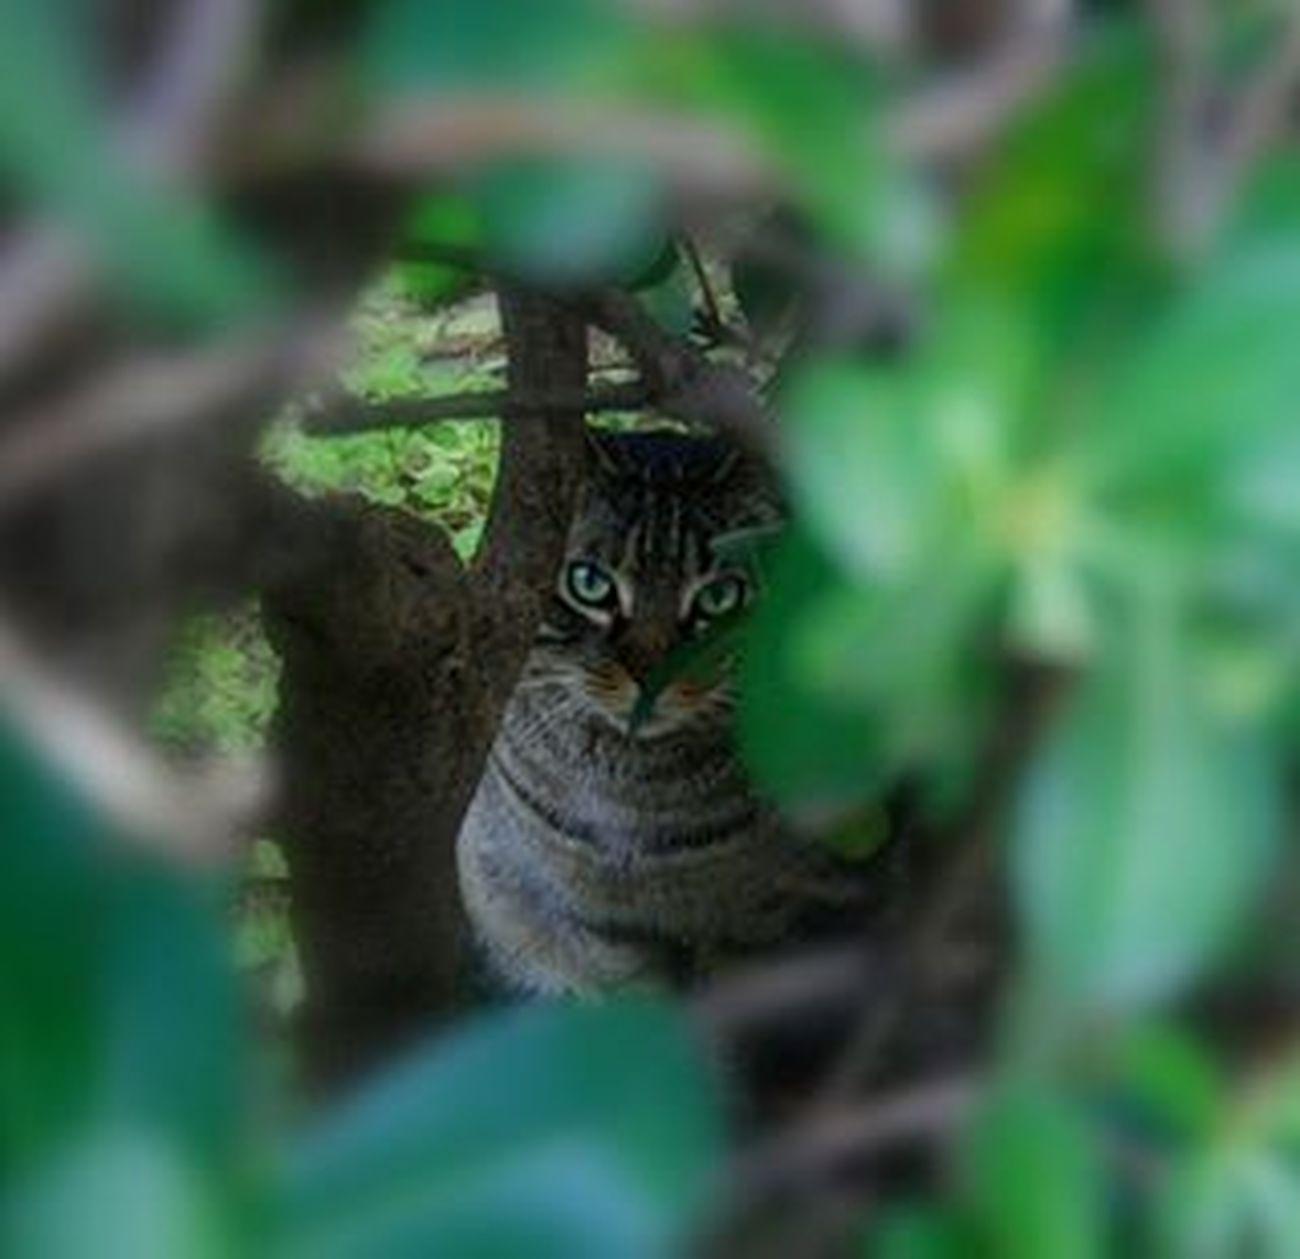 Hide and Seek ! Hideandseek Cat Gatto Katze Kitty Micio Miao Meow Green Verde Greeneyes Animals Pet Bush Hiding Nascondino Gatti Italy Occhiverdi Animales Instacat Picoftheday Grumpycat grumpy